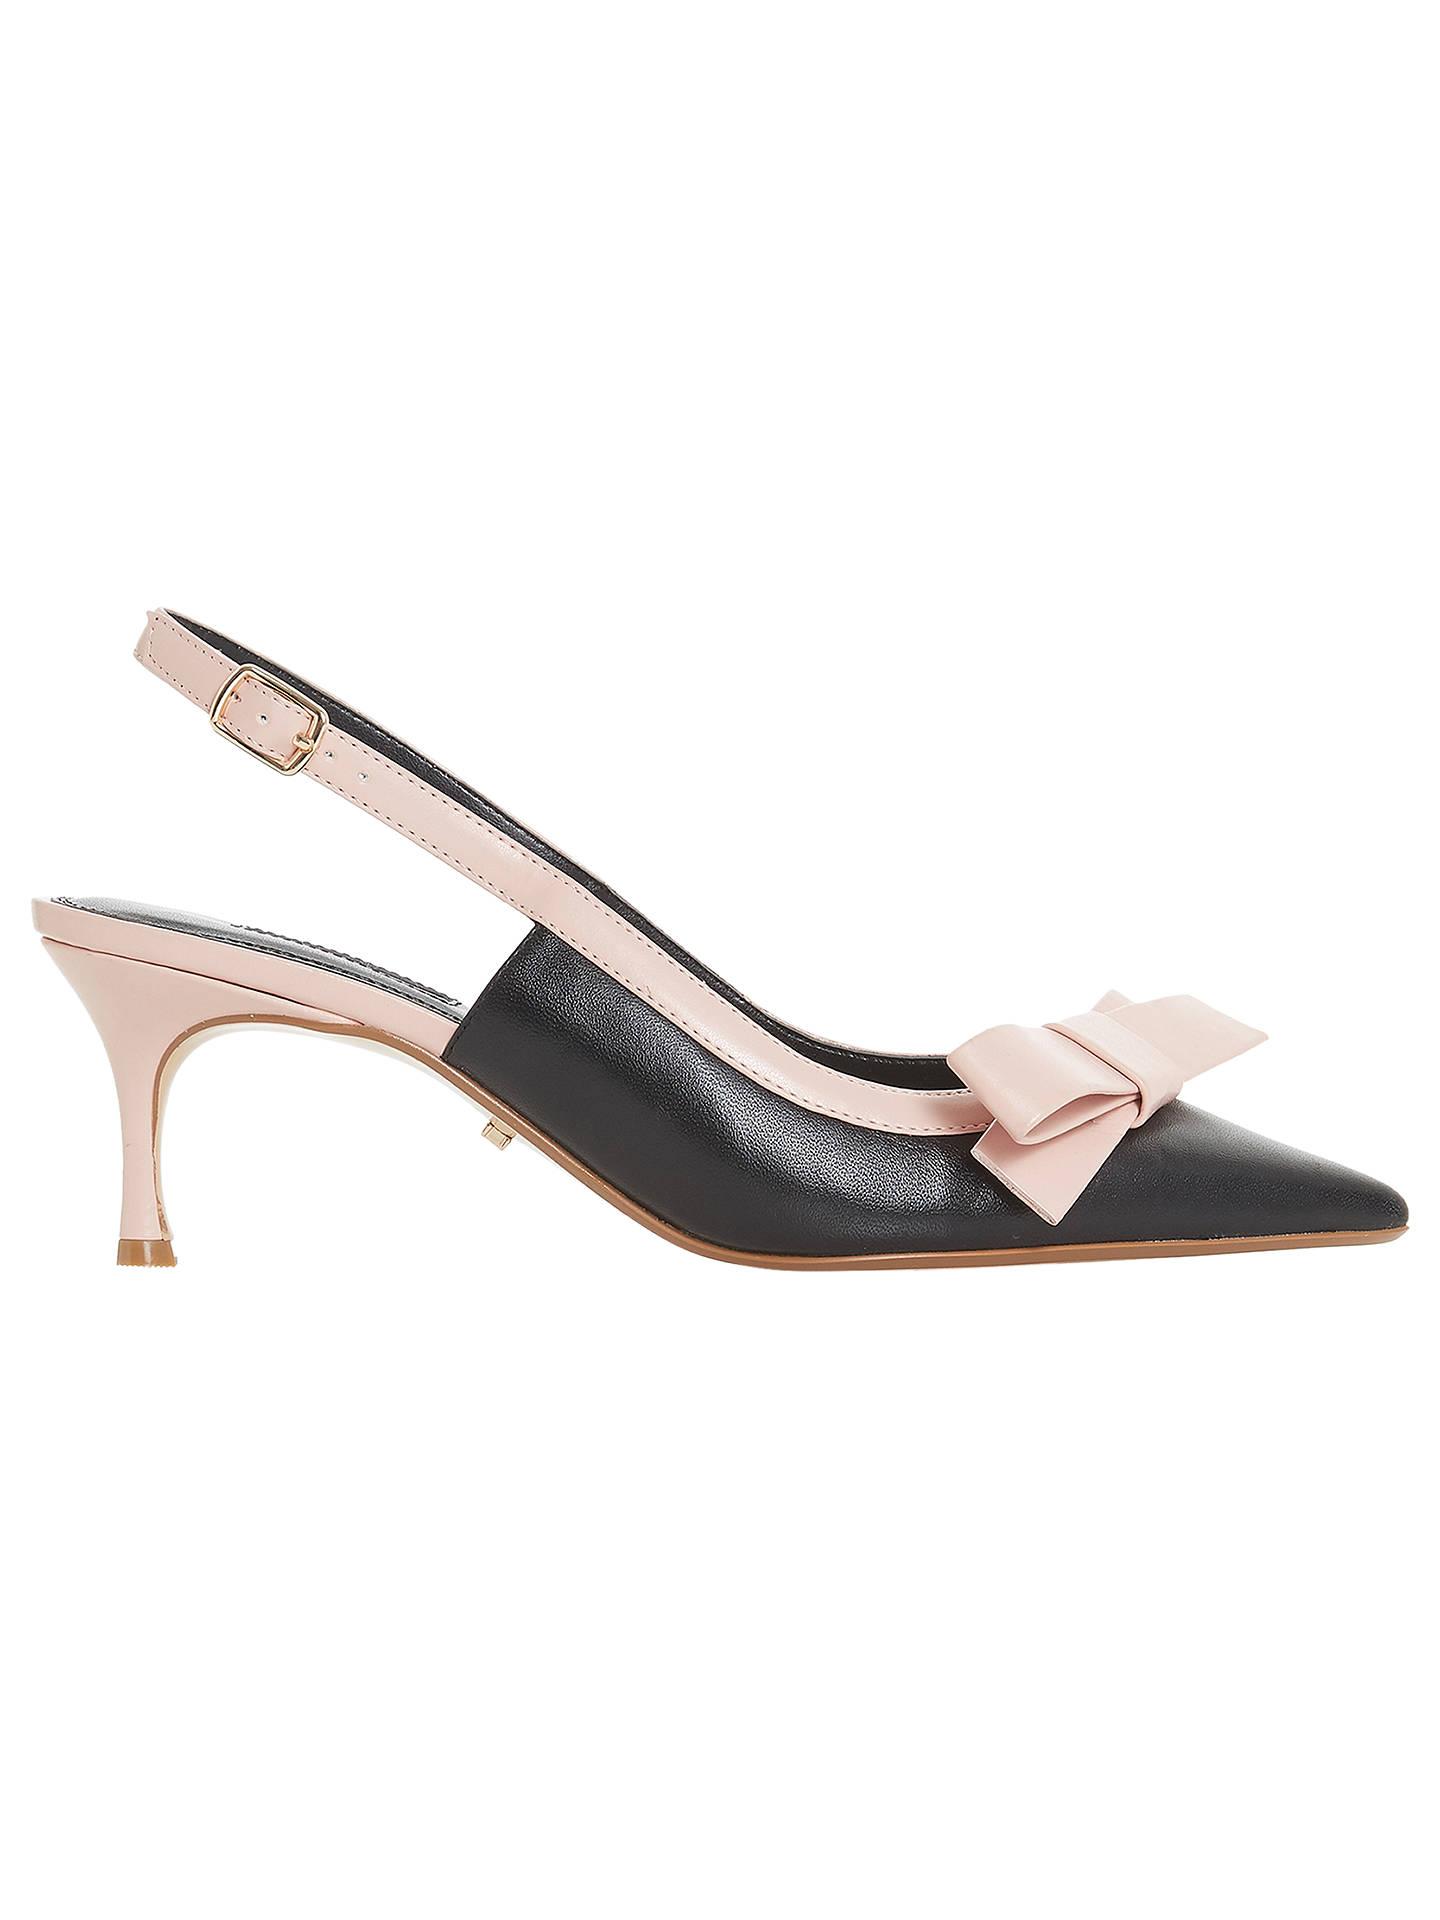 65c6365abc83 Buy Dune Clemmiee Kitten Heel Slingback Court Shoes